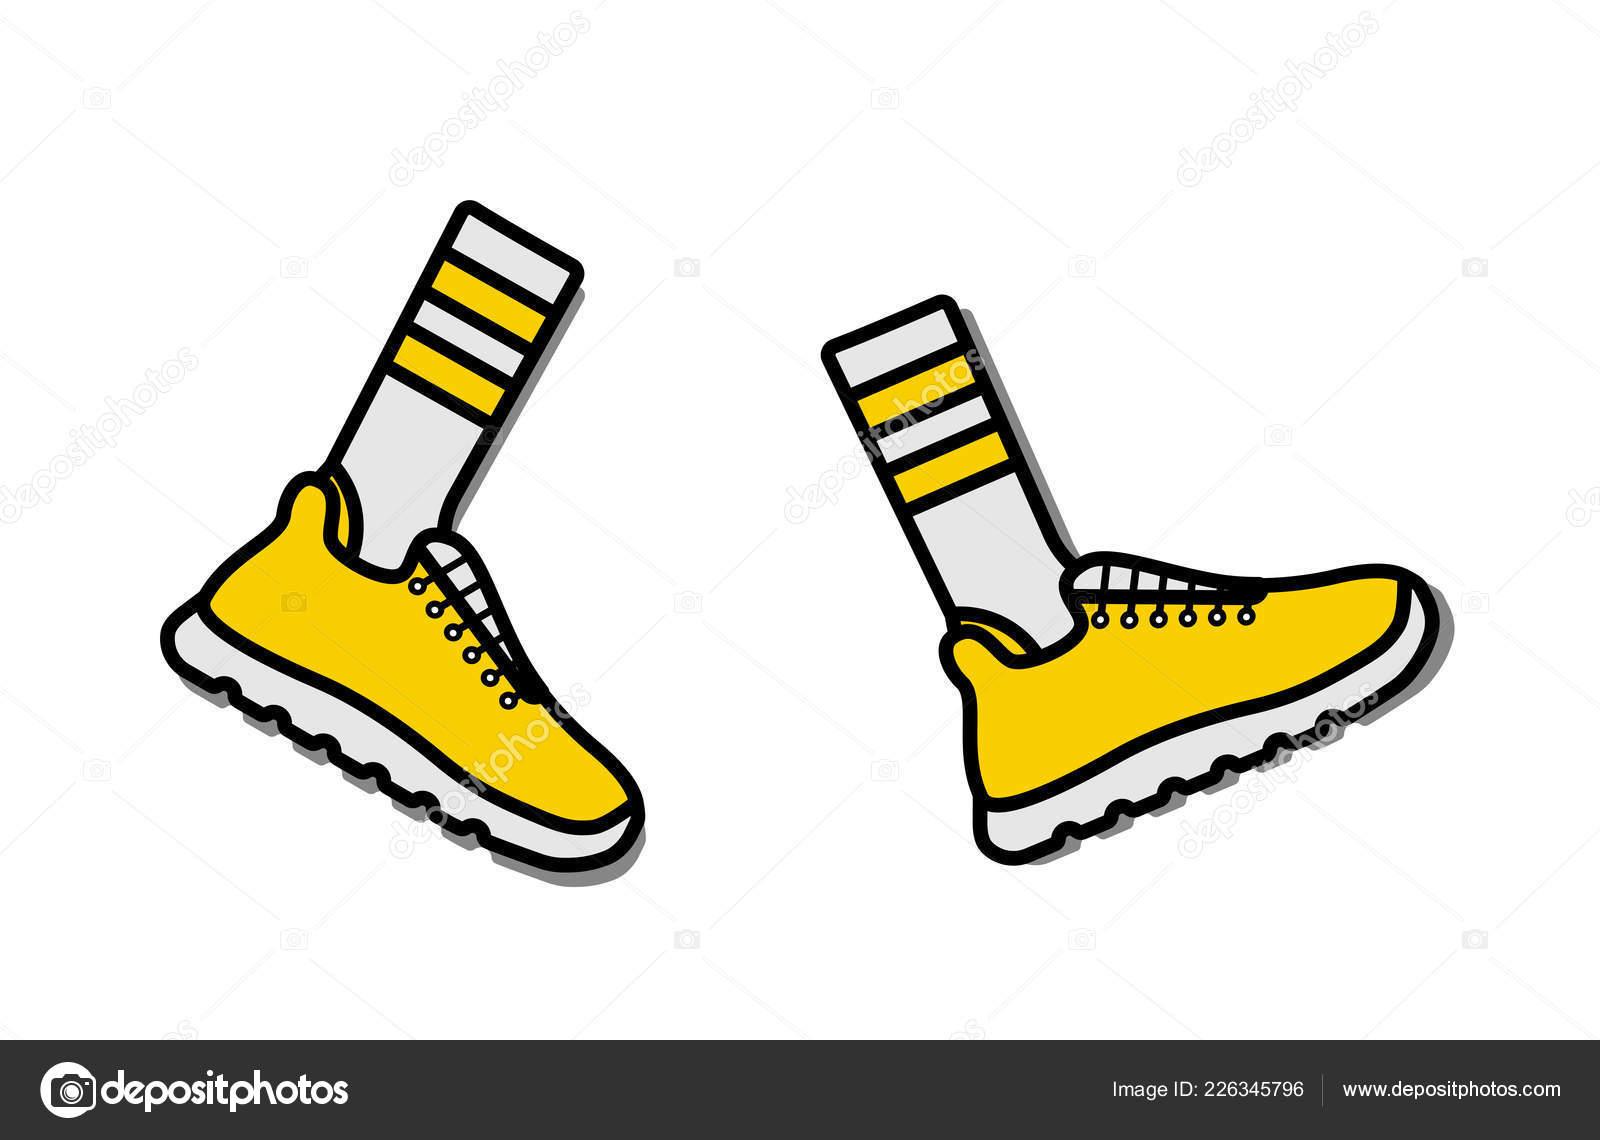 16101bce23c Vector εικονογράφηση εικόνα της αθλητικά παπούτσια (σπορτέξ ...